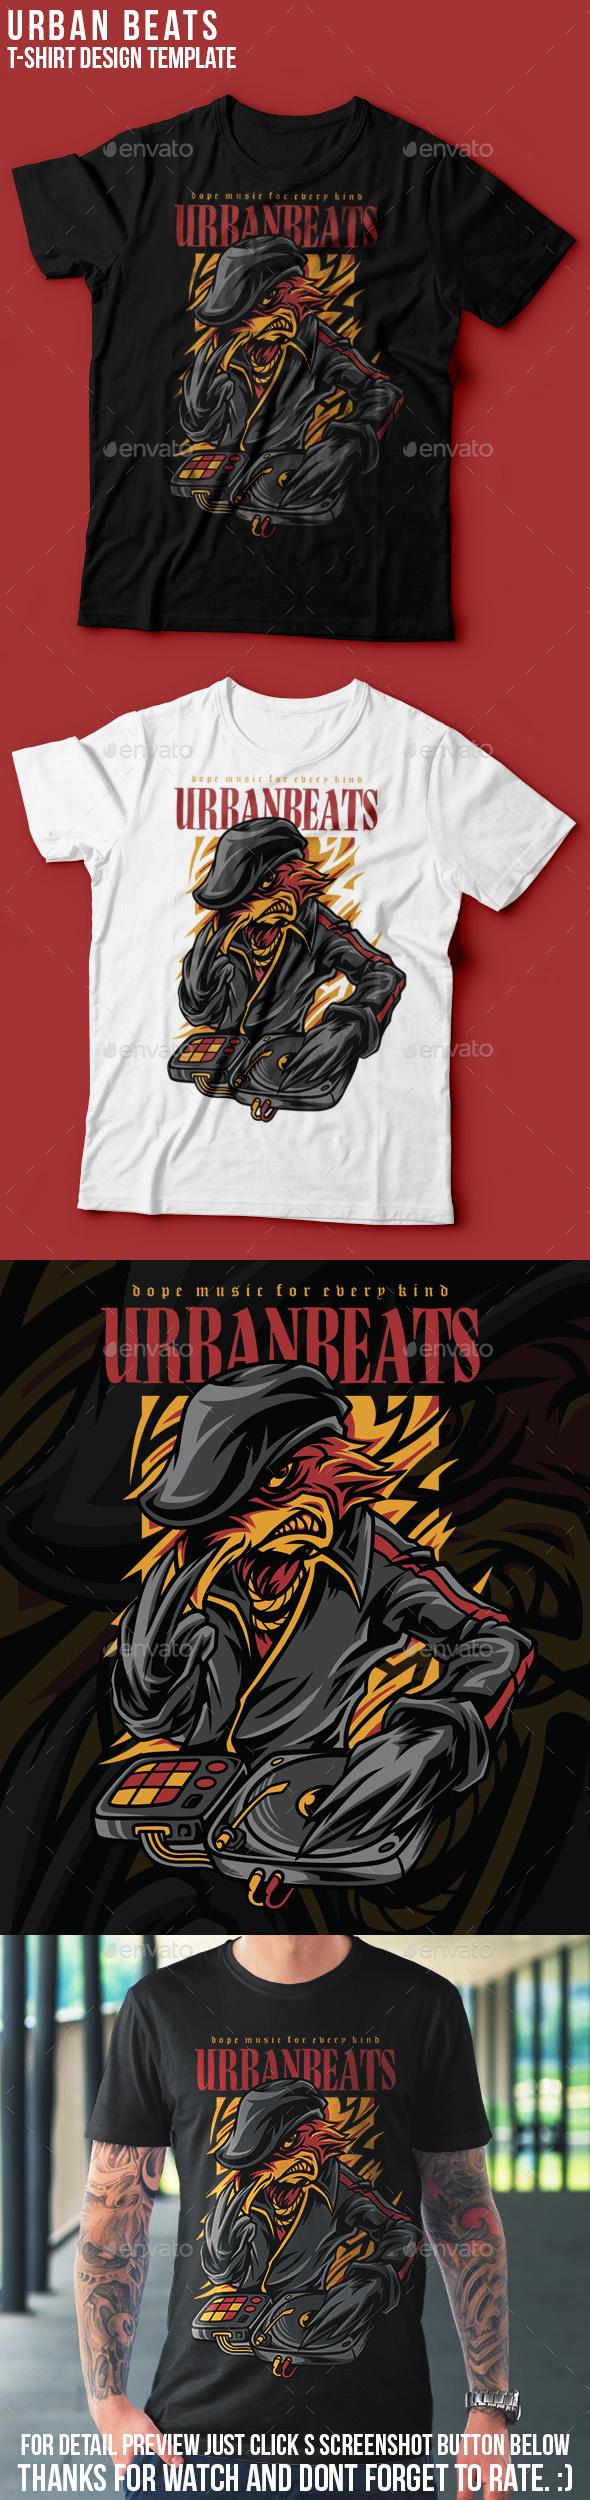 Urban Beats T-Shirt Design